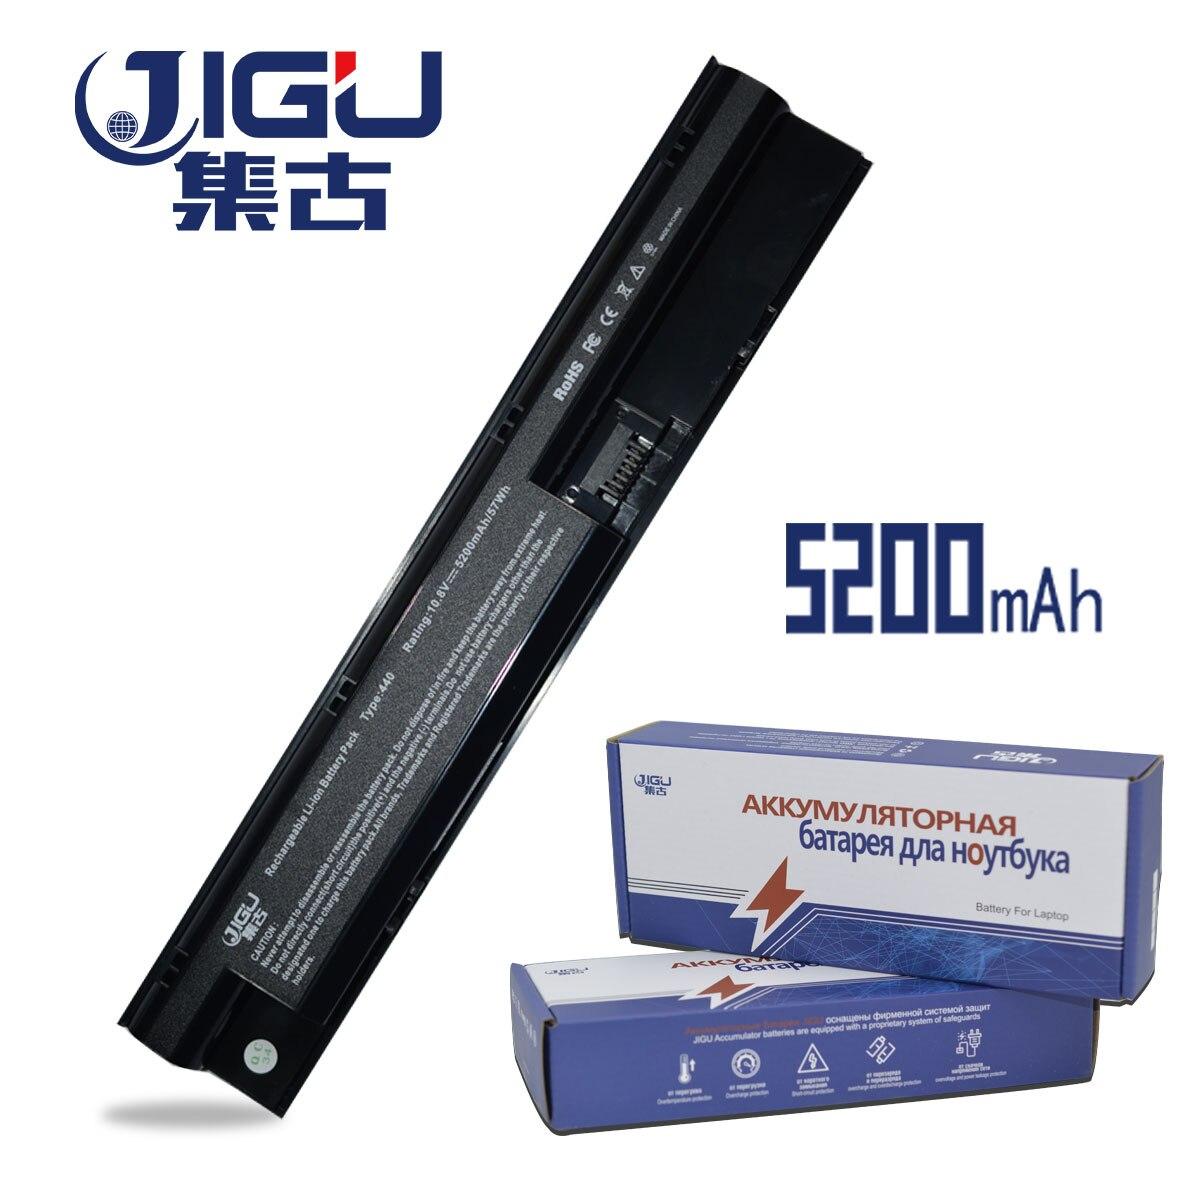 все цены на JIGU 5200mah Laptop Battery For HP COMPAQ ProBook 440 445 450 455 470 G0 G1 G2 707617-421 708457-001 708458-001 FP06 FP06XL FP09 онлайн